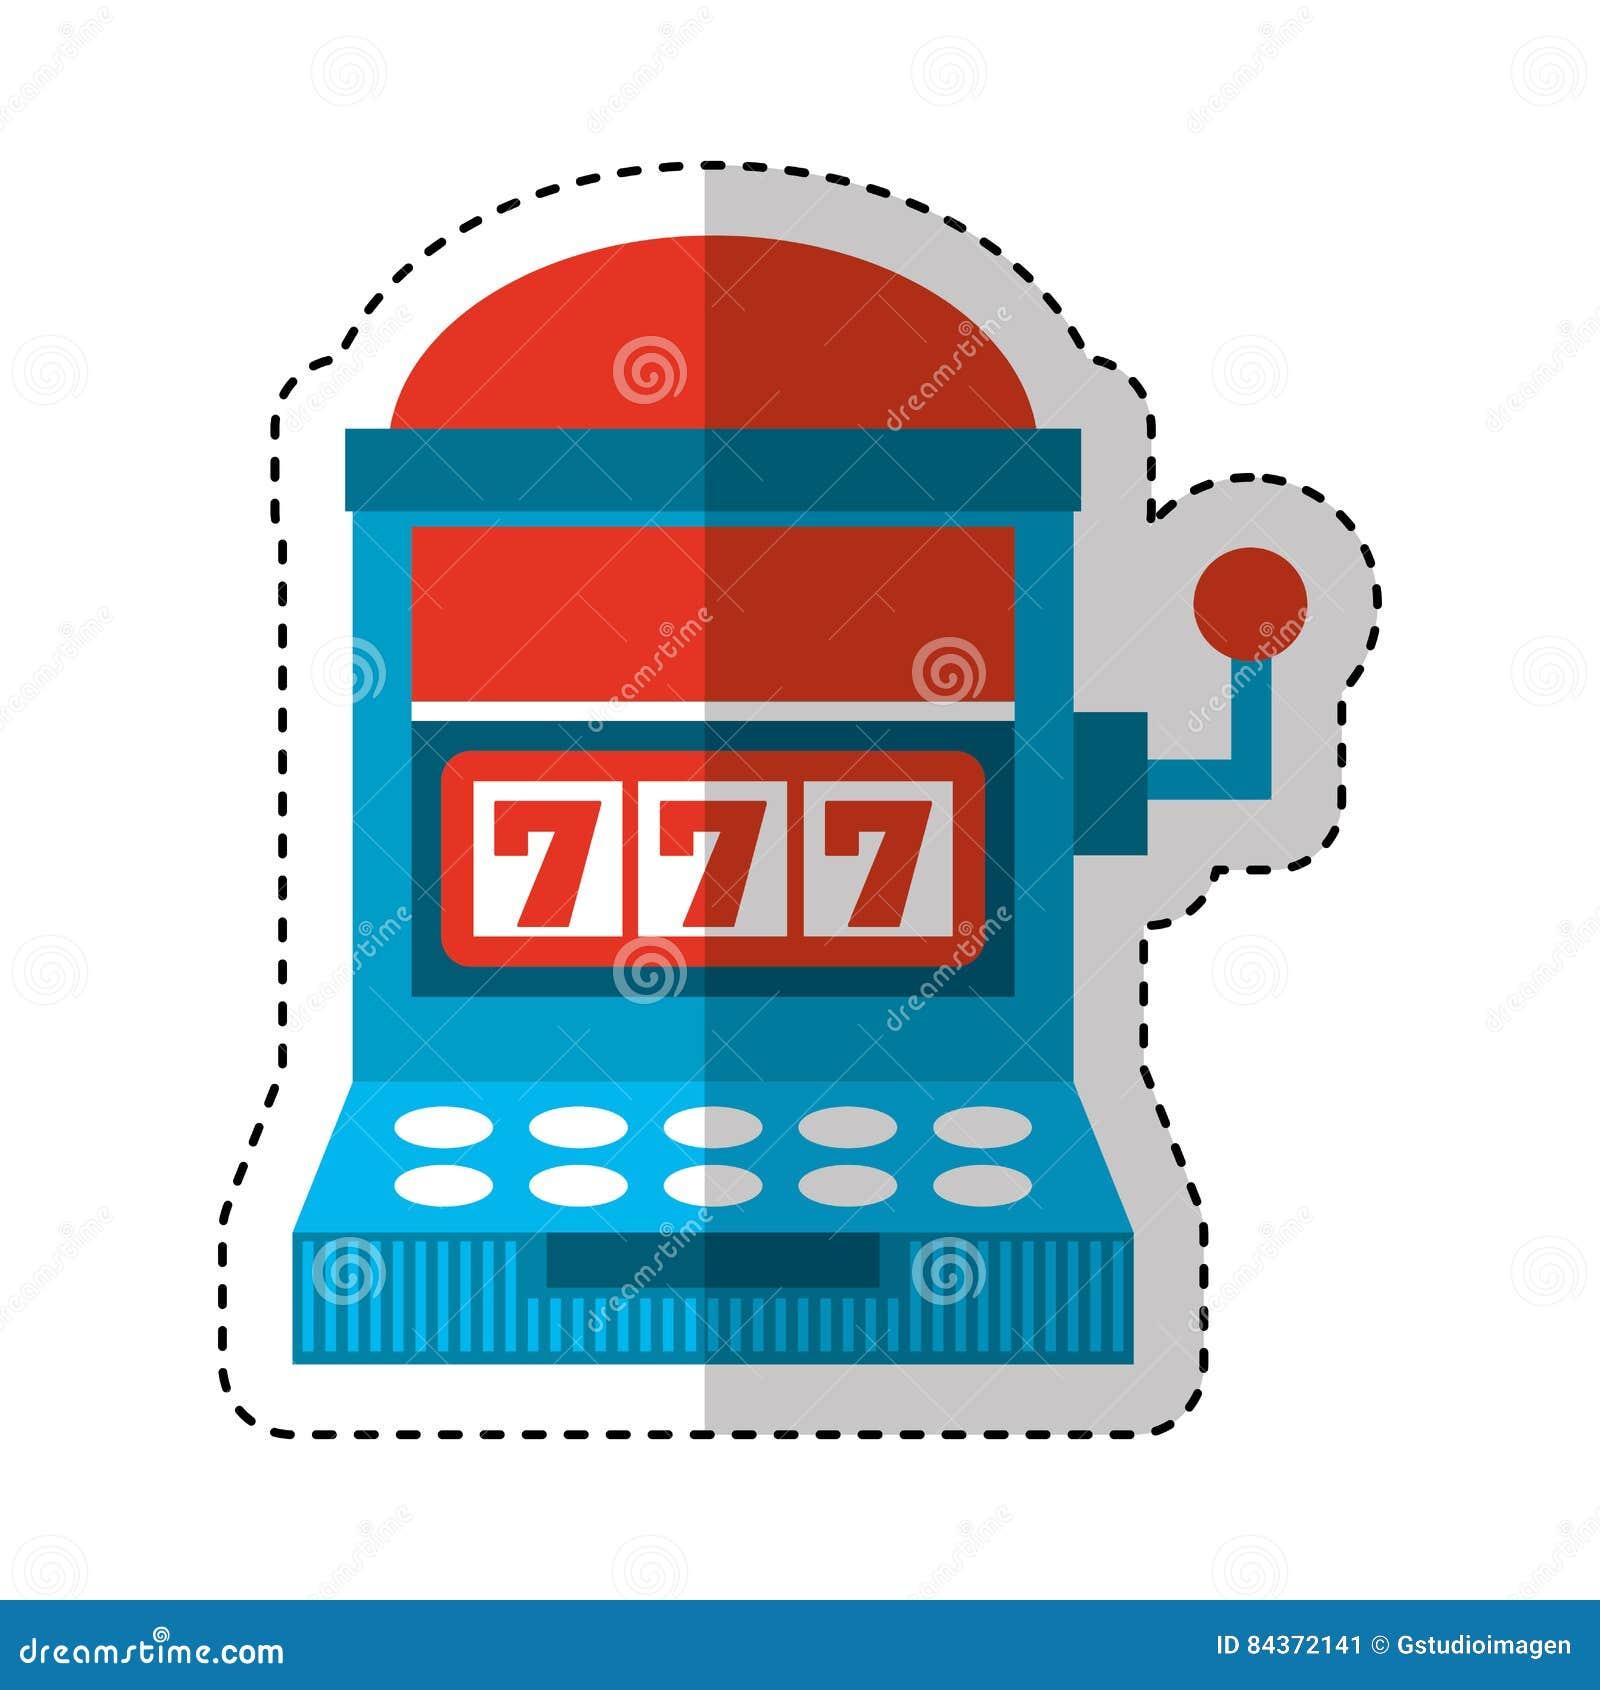 casino slots machine icon royalty free illustration Gambling Addiction Statistics Gambling Addiction Cartoons